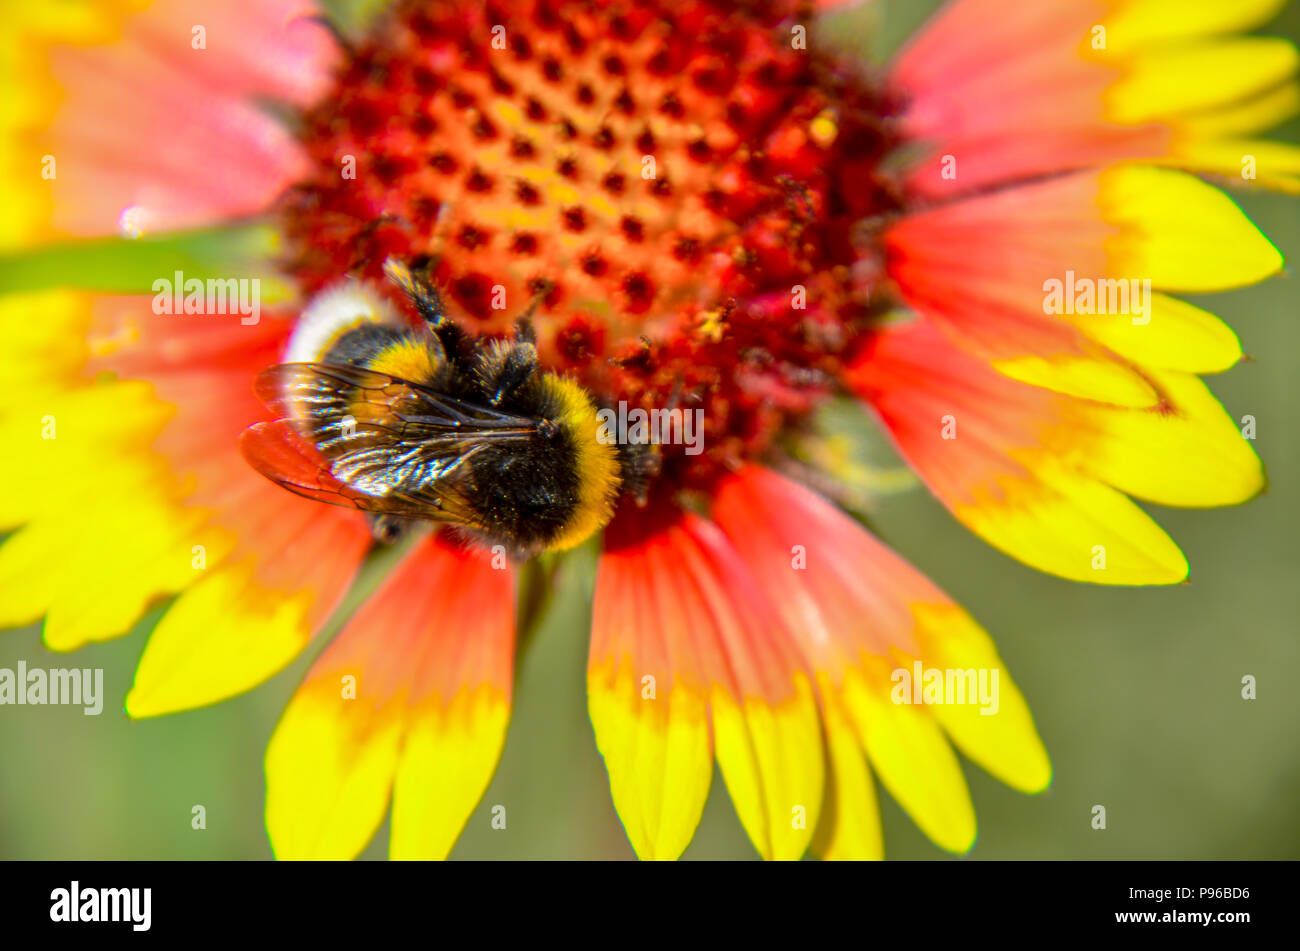 Bee on yellow and orange flower head of rudbeckia black-eyed susan - Stock Image